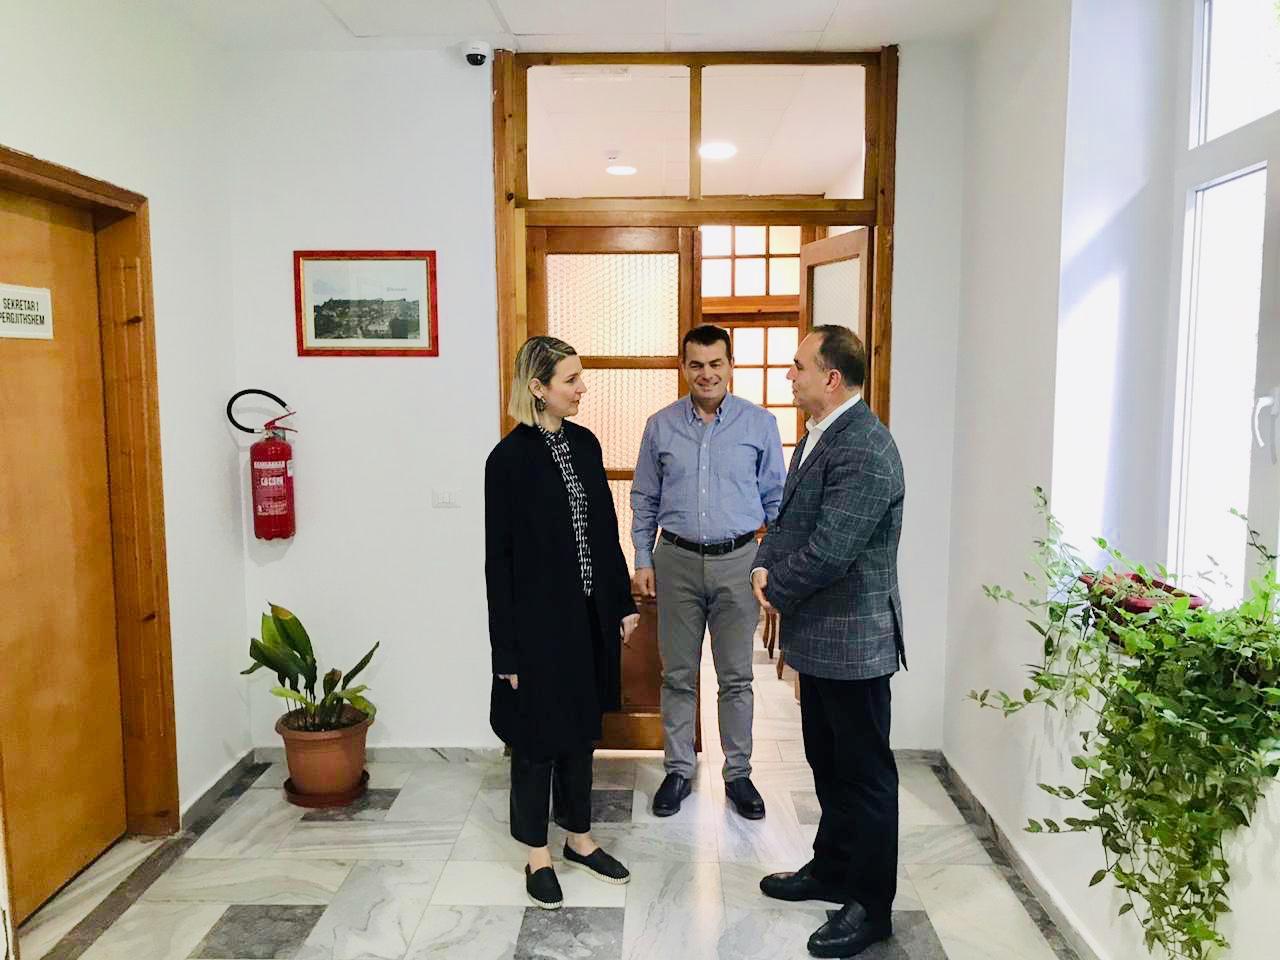 Takim zyrtar me Ministren e Kulturёs znj. Elva Margariti